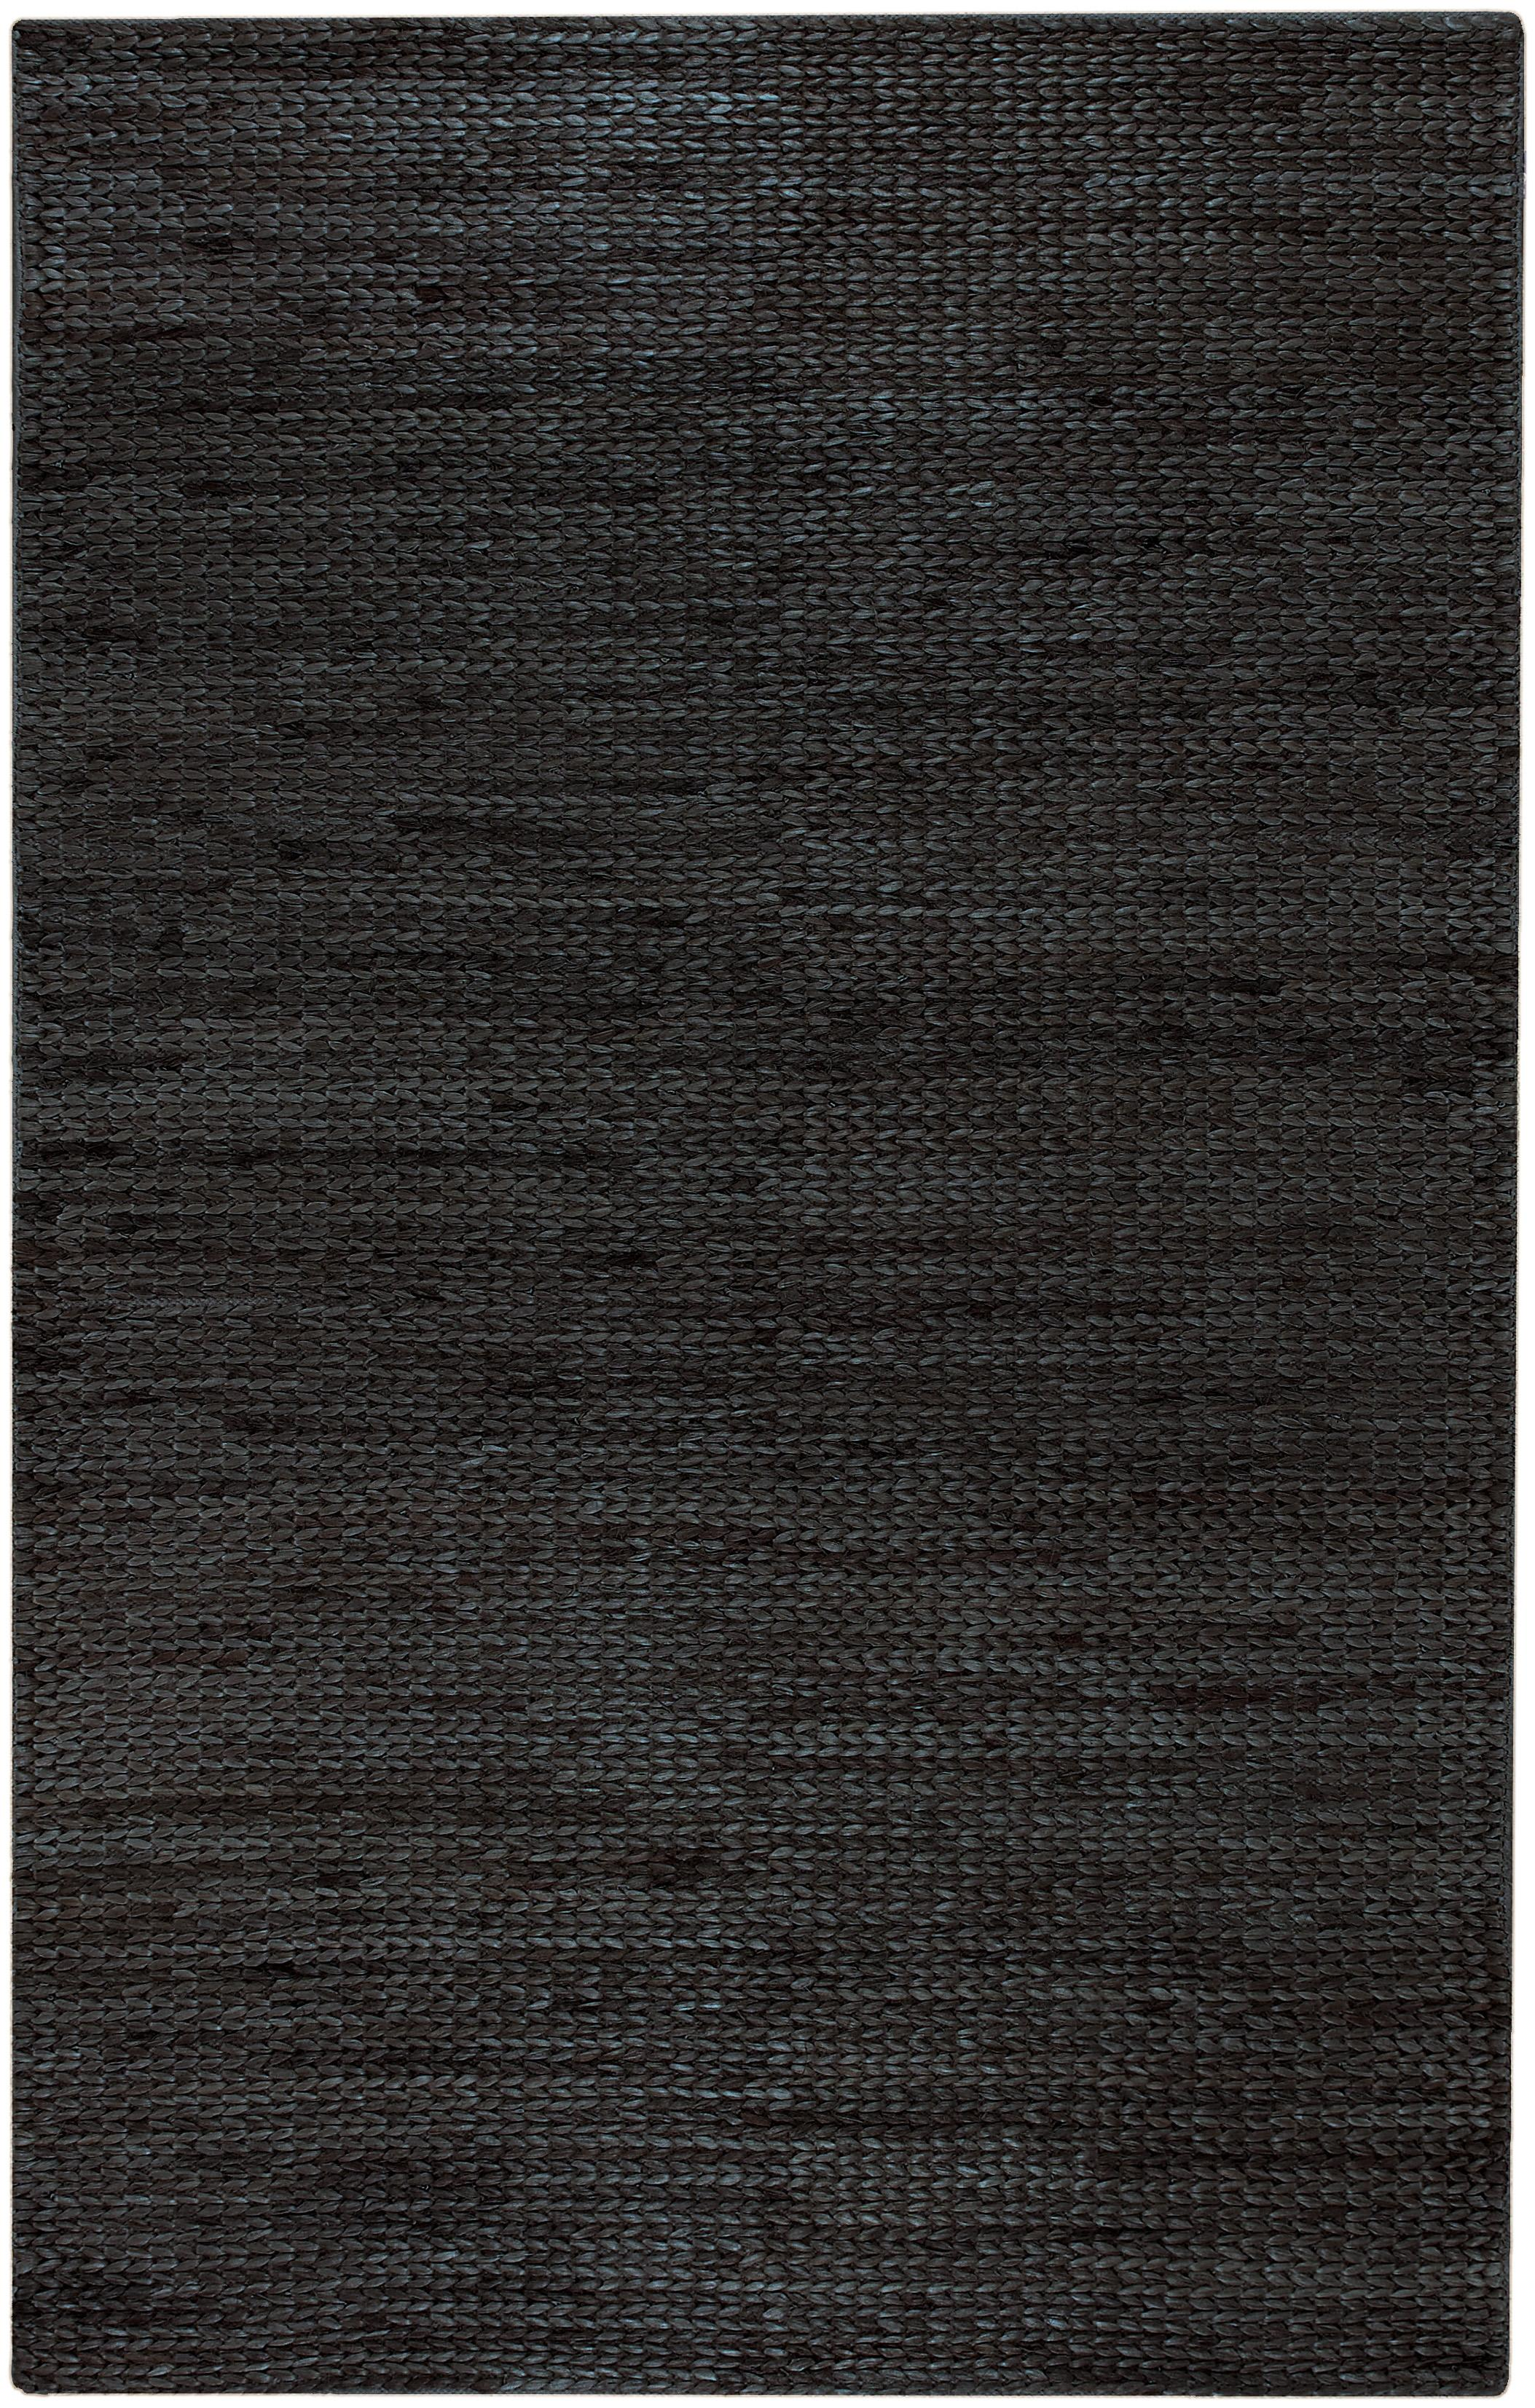 Surya Rugs Tropics 5' x 8' - Item Number: TRO1035-58